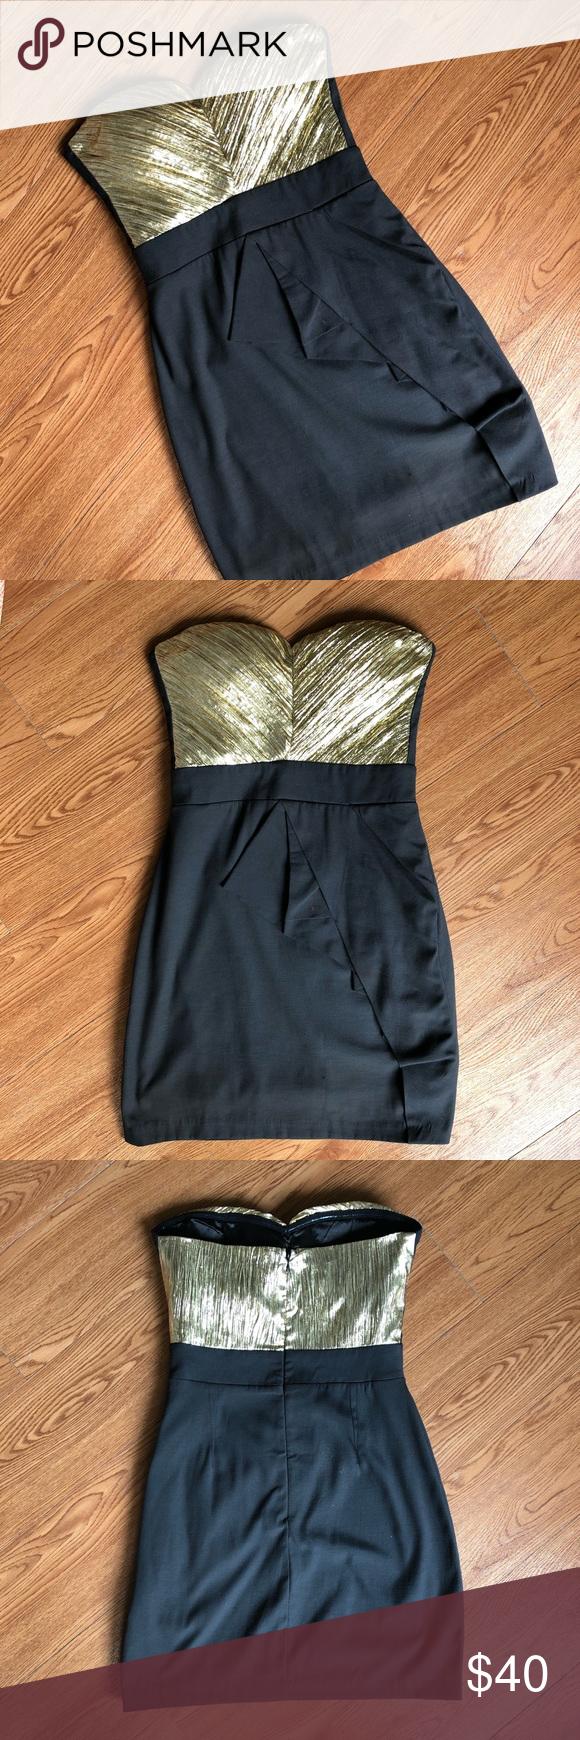 Sweetheart Shiny Gold Dress